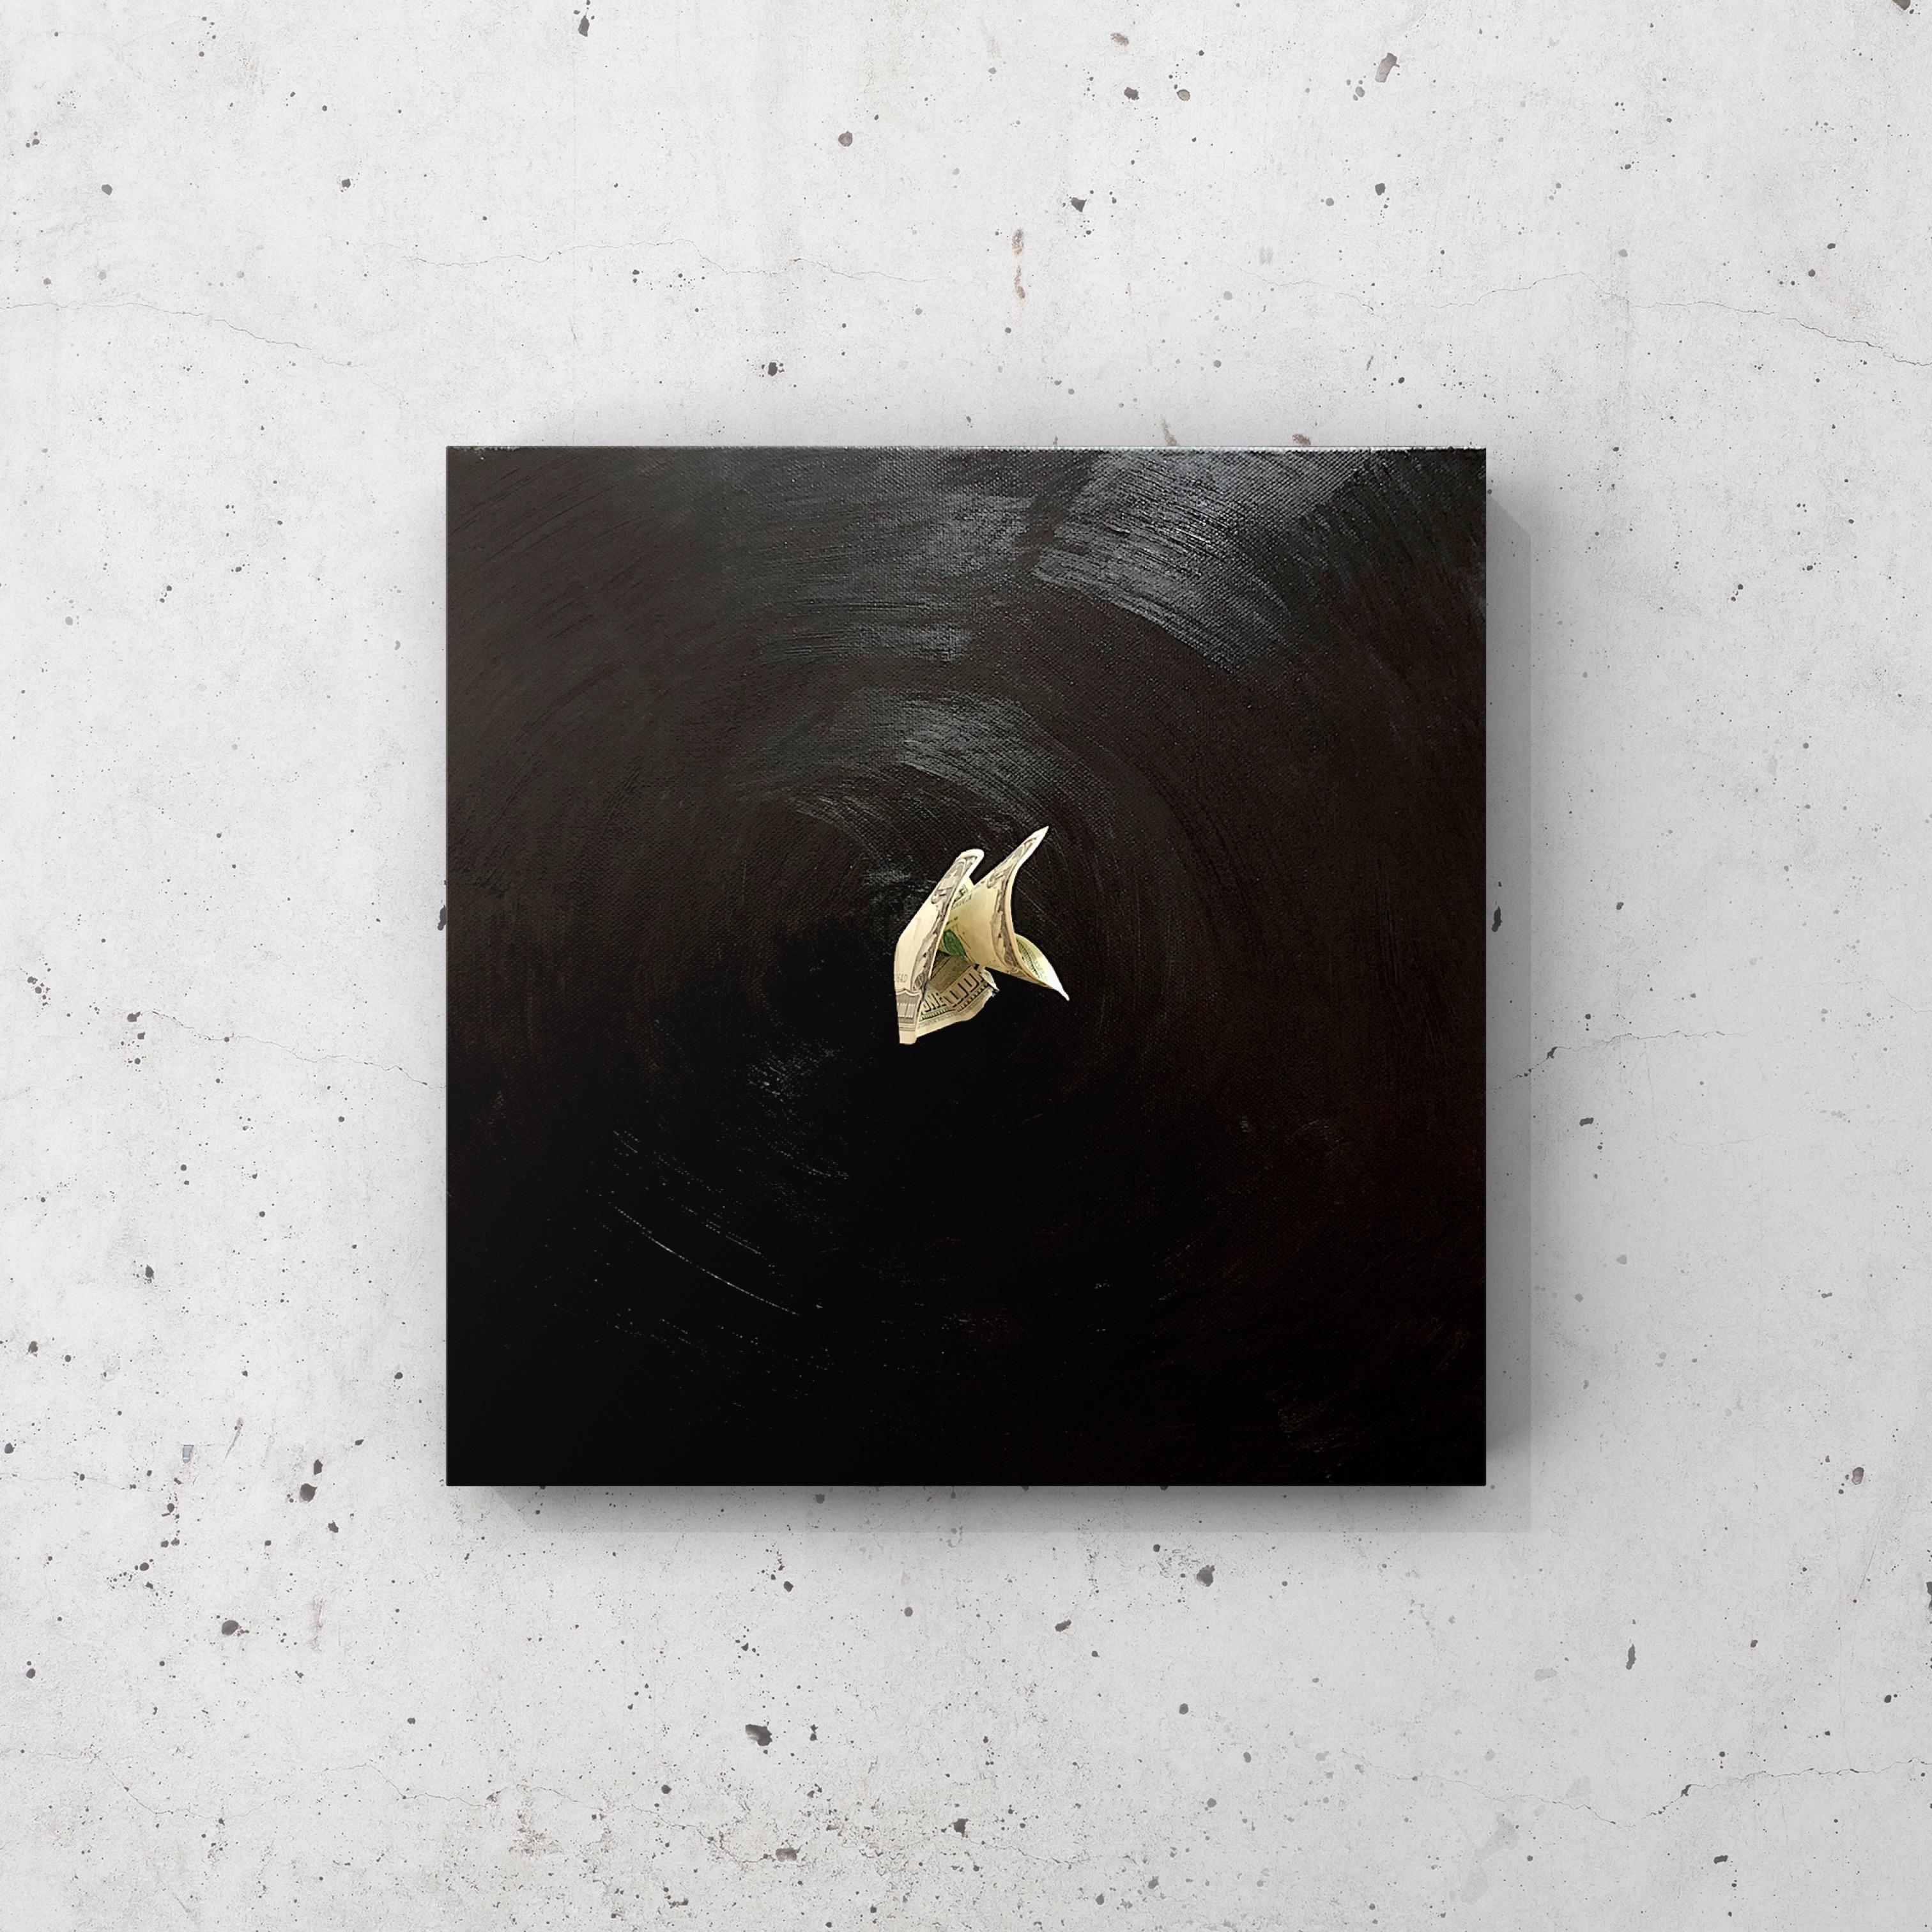 Картина «Чёрная дыра», 2019. Художник: Colonel Royce